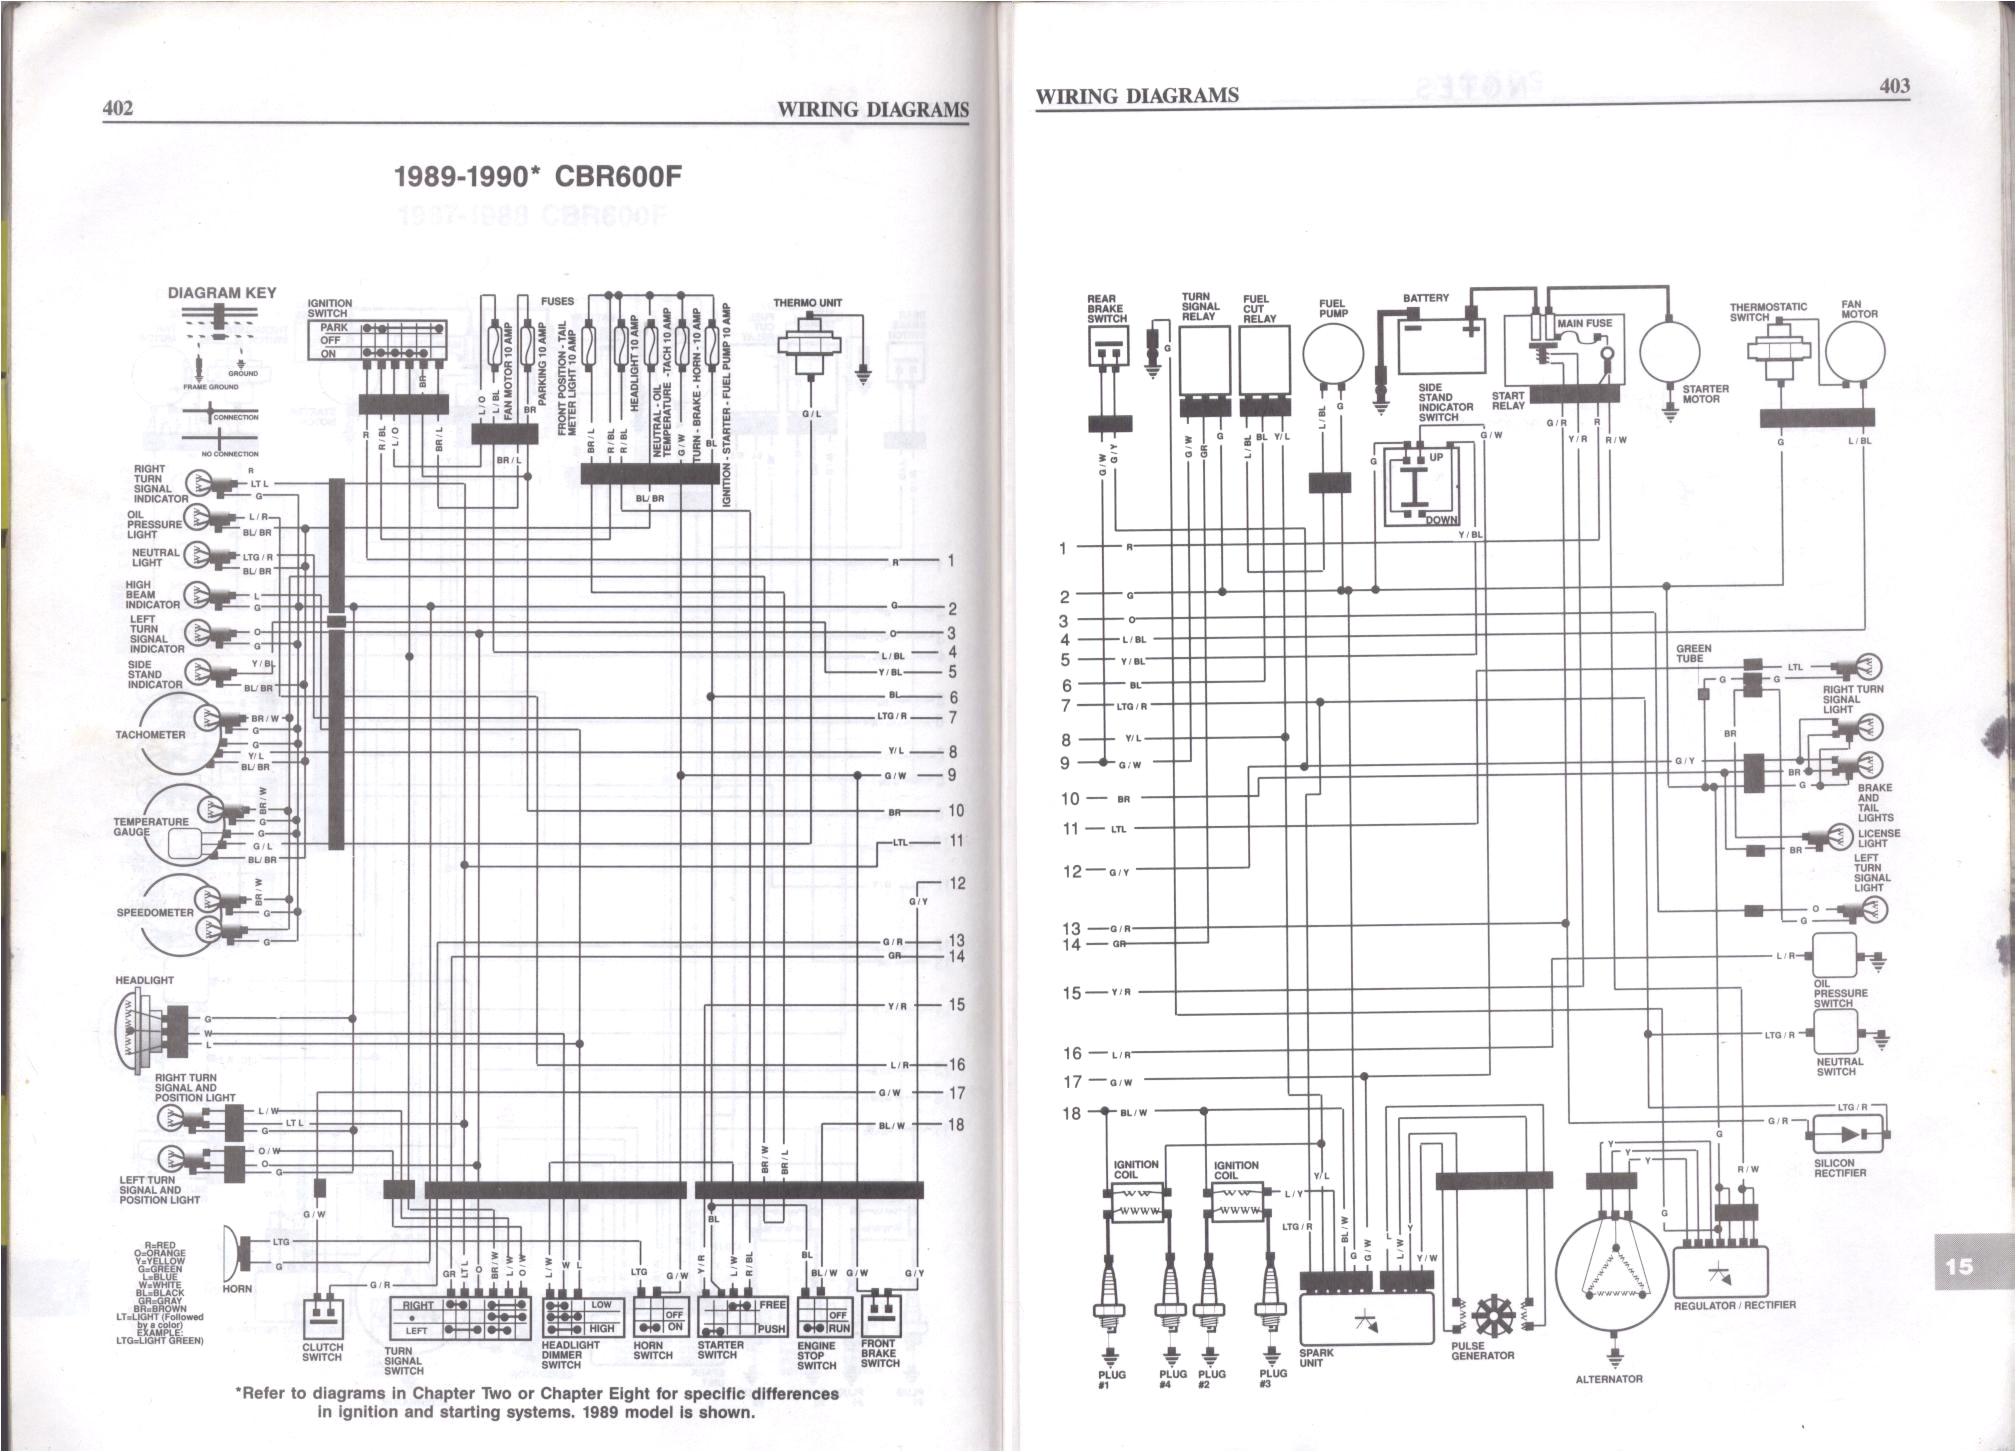 wiring diagram program wiring diagram software new wiring diagram honda c70 inspirationa index 0 0d 9g jpg